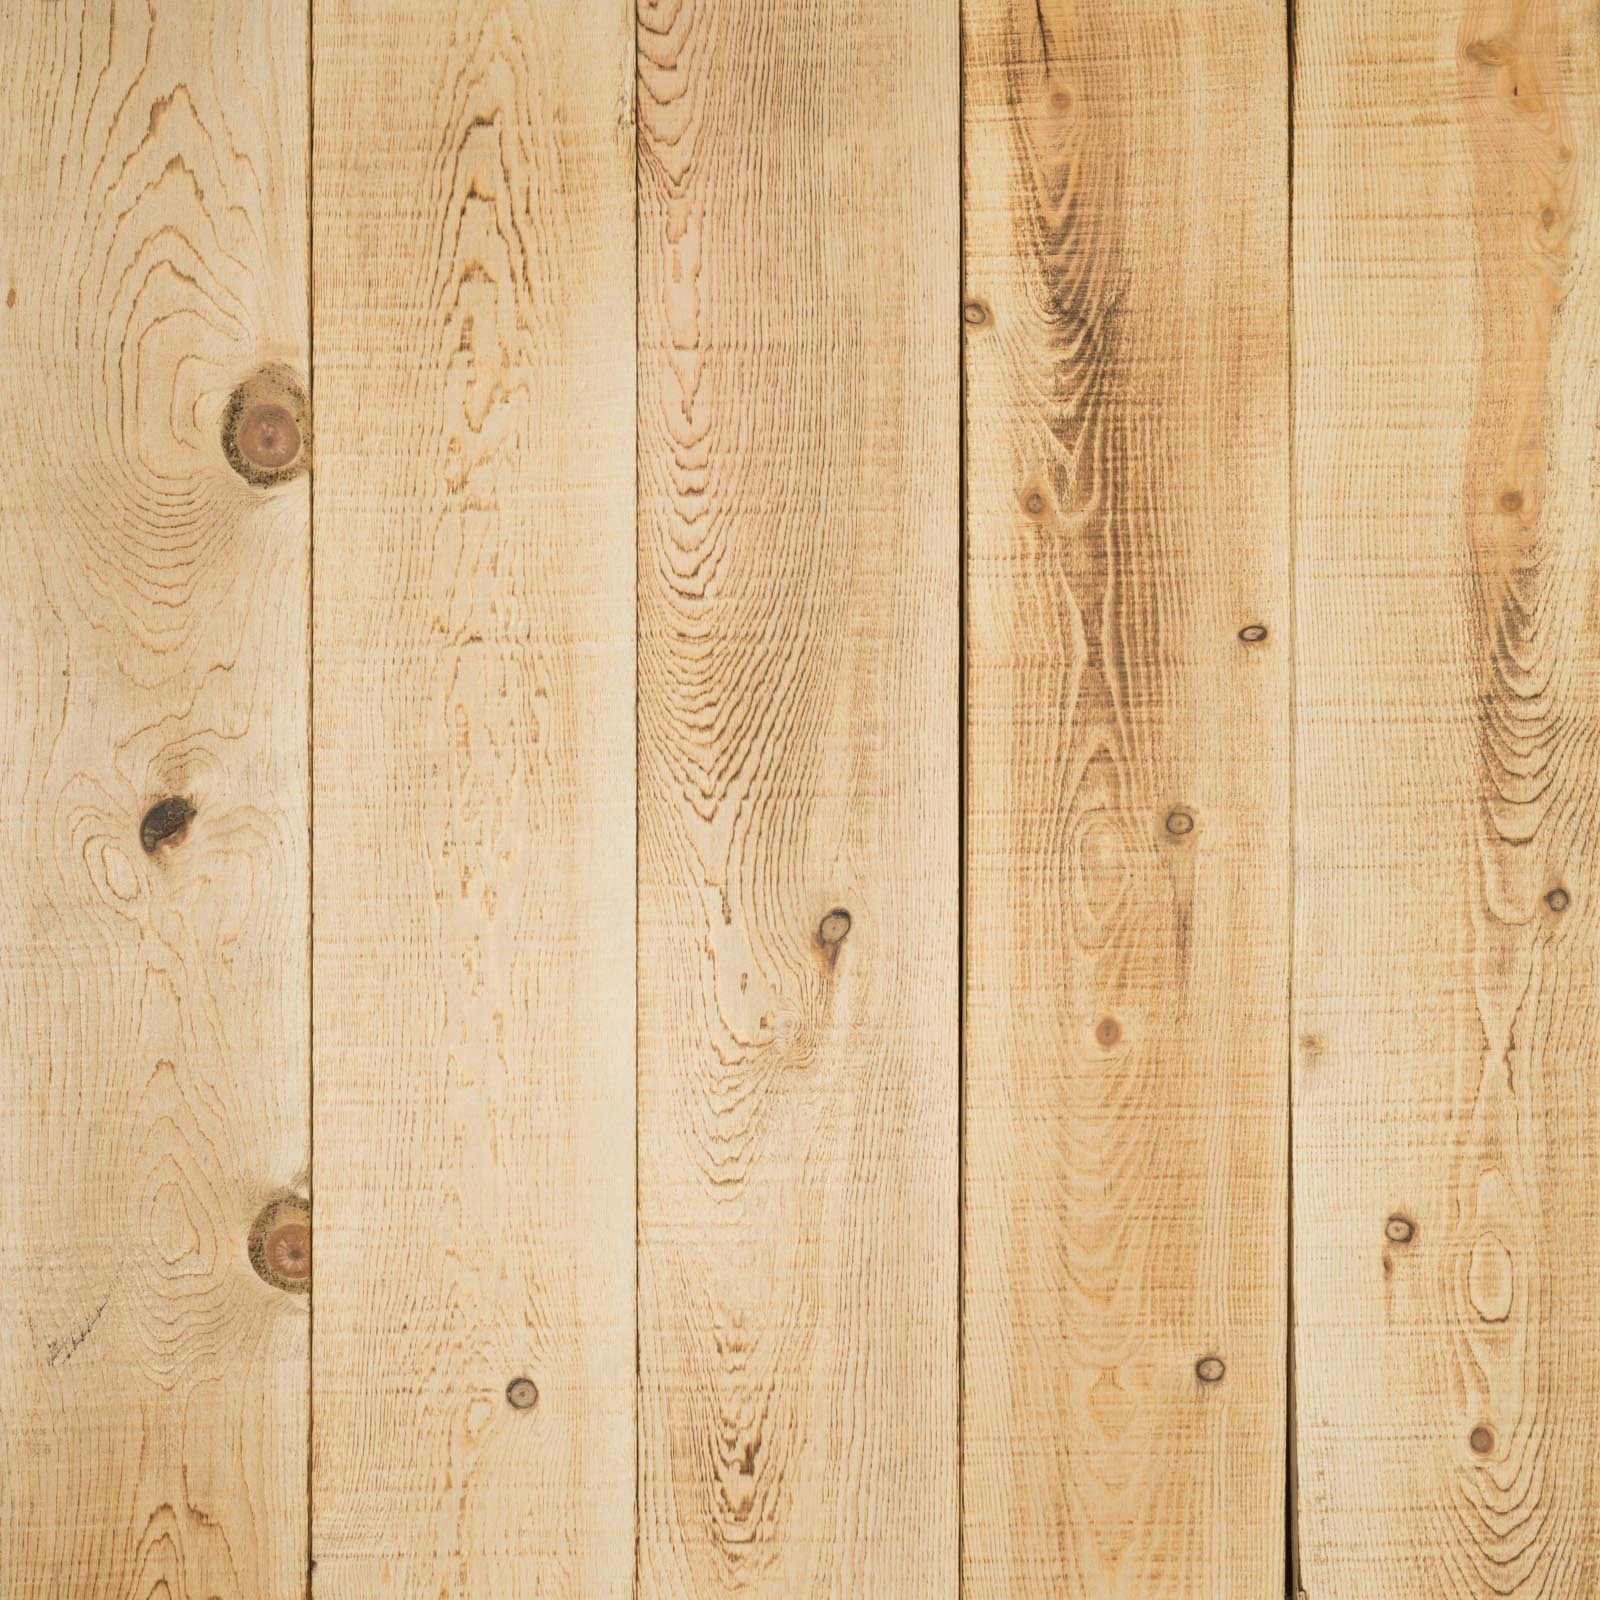 Natural Northwestern Spruce Boards Hewn Elements